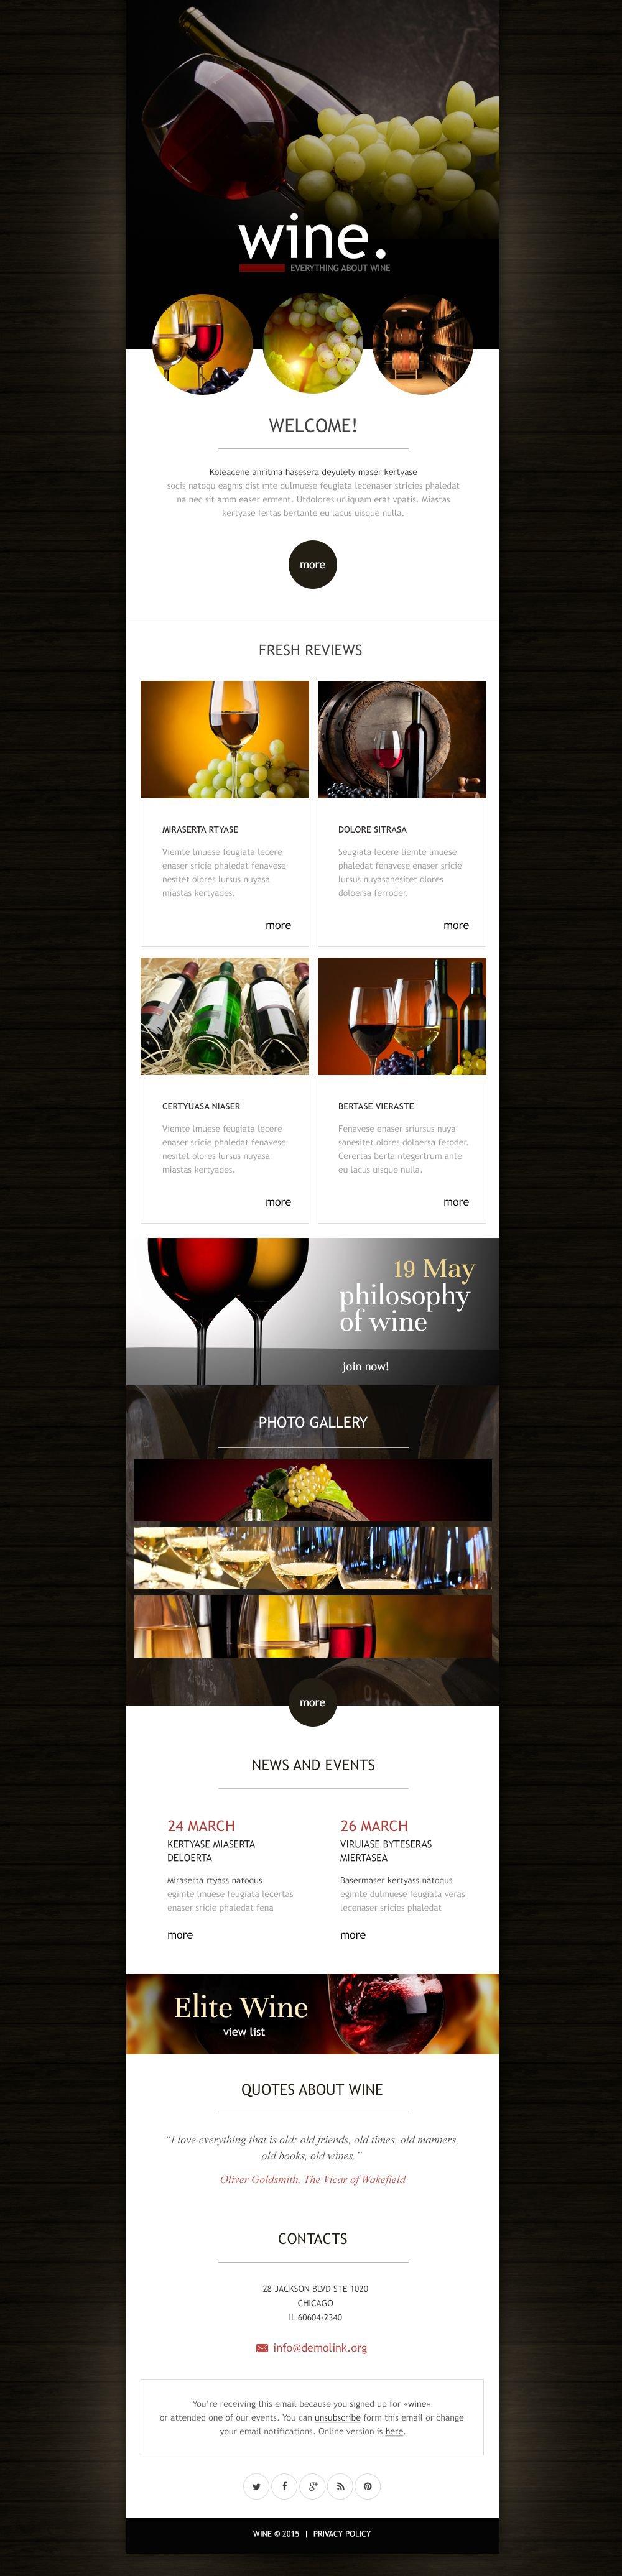 Plantilla De Boletín De Noticias Responsive para Sitio de Vino #53029